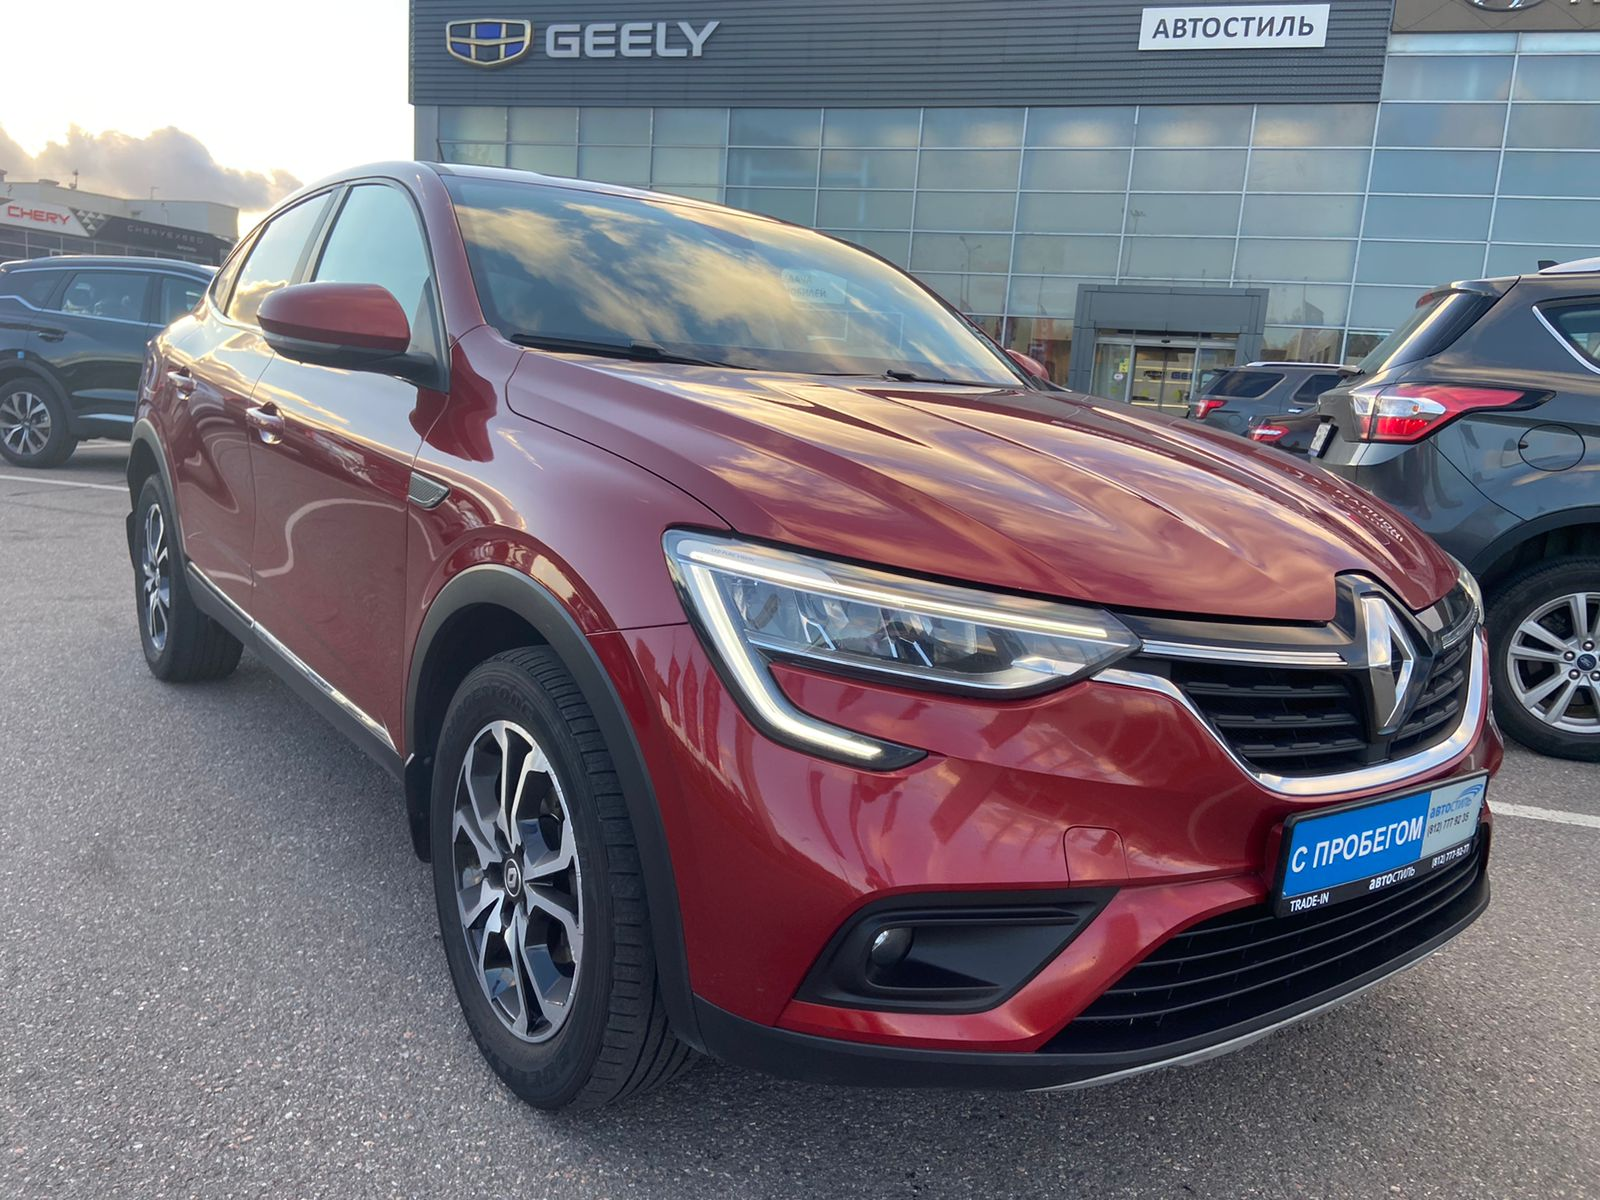 Renault Arkana, 1 поколение